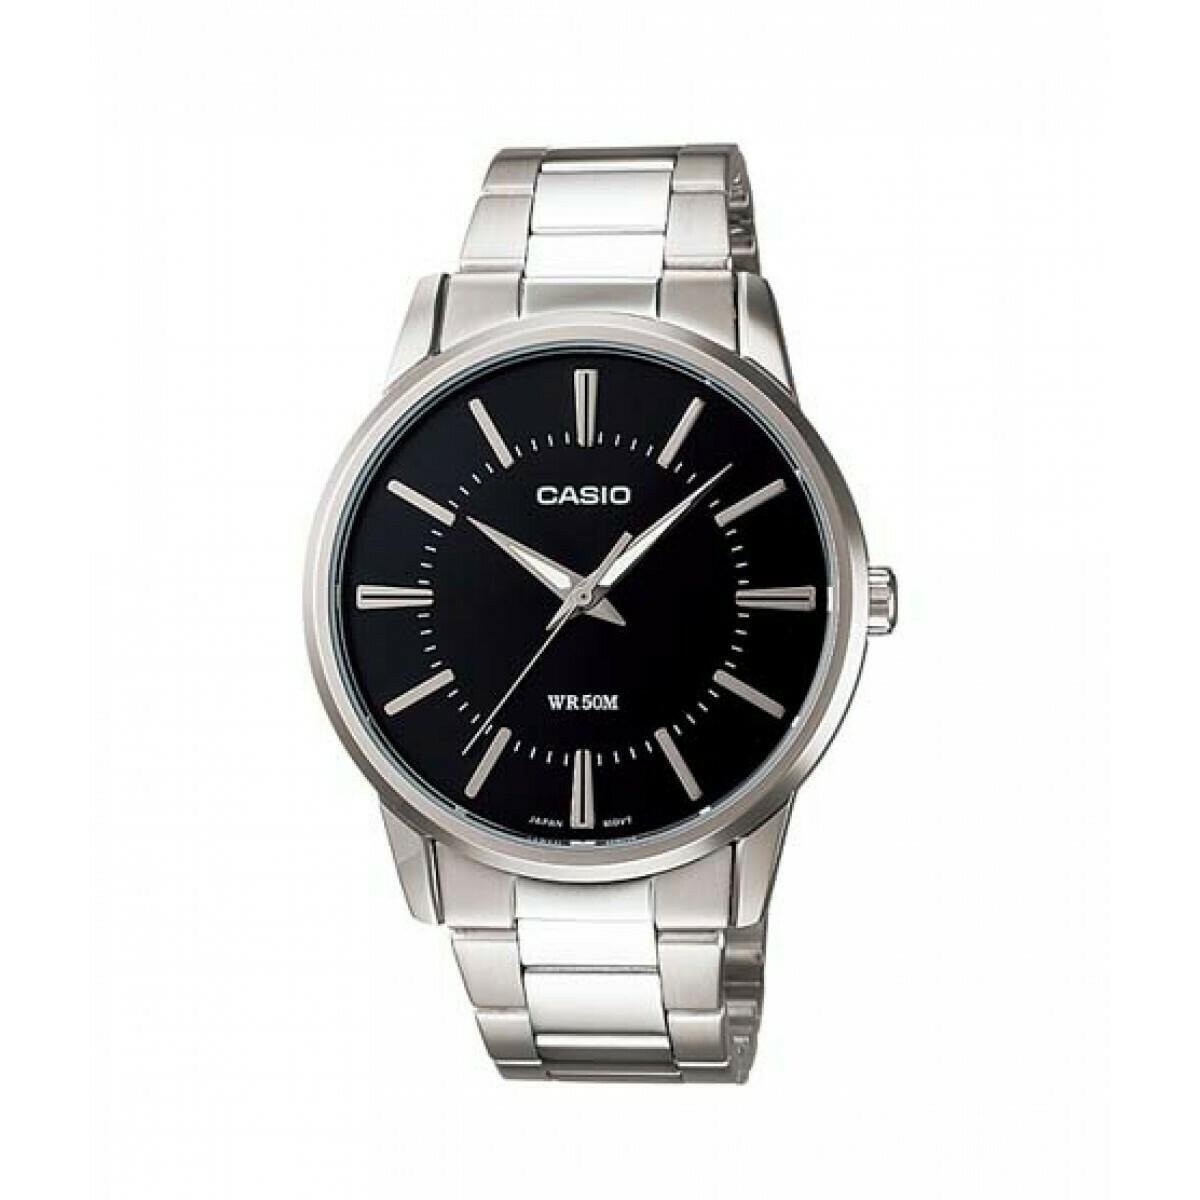 Casio Enticer MTP-1303D-1AVDF Analog Wrist Watch For Men - Silver